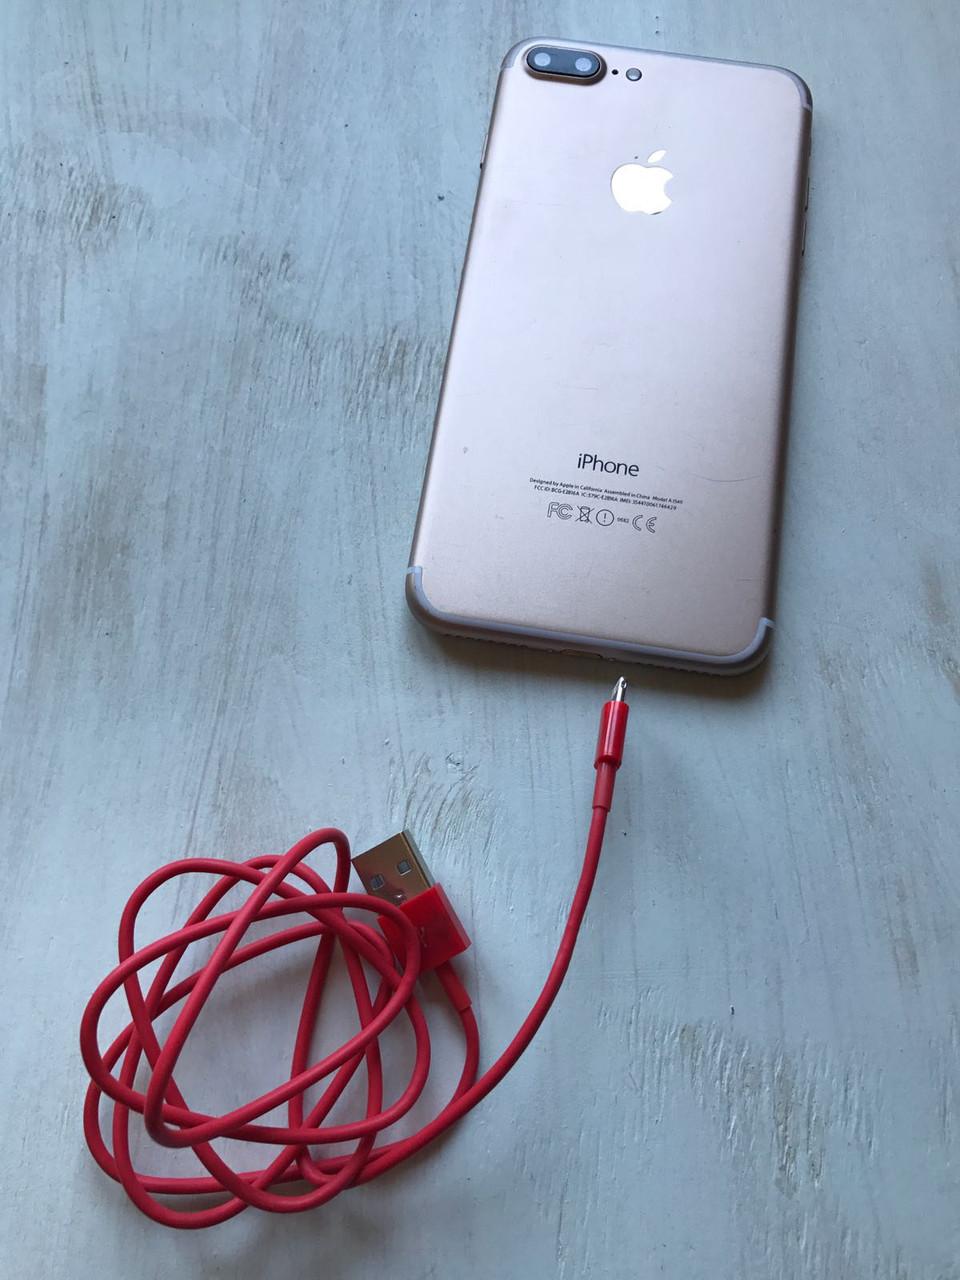 Зарядный кабель USB Charge Cable красного цвета для iPhone, iPad Mini Air